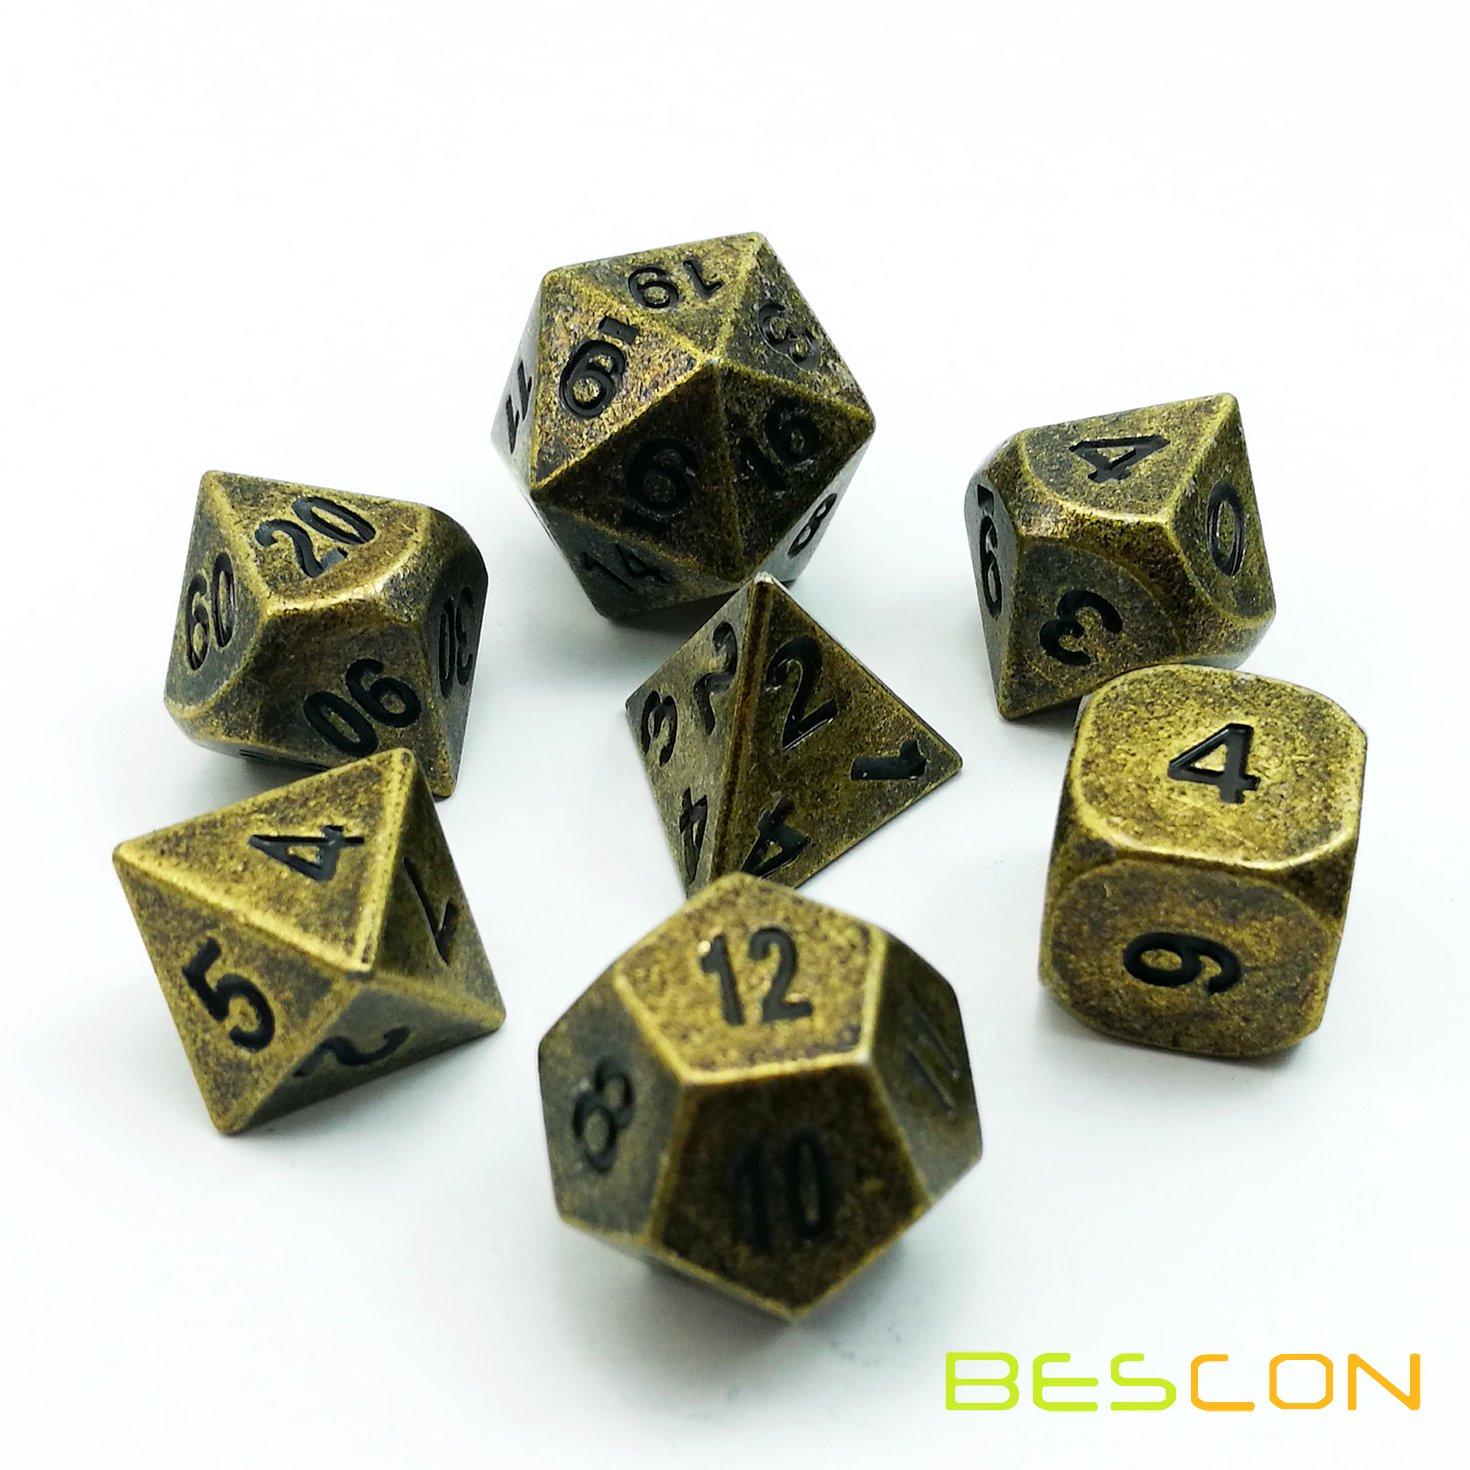 Bescon古代真鍮ソリッドメタルD & D Polyhedral Dice Set Of 7アンティーク銅メタルRPG Role Playing Game Dice 7pcsセット   B076WM5JFY